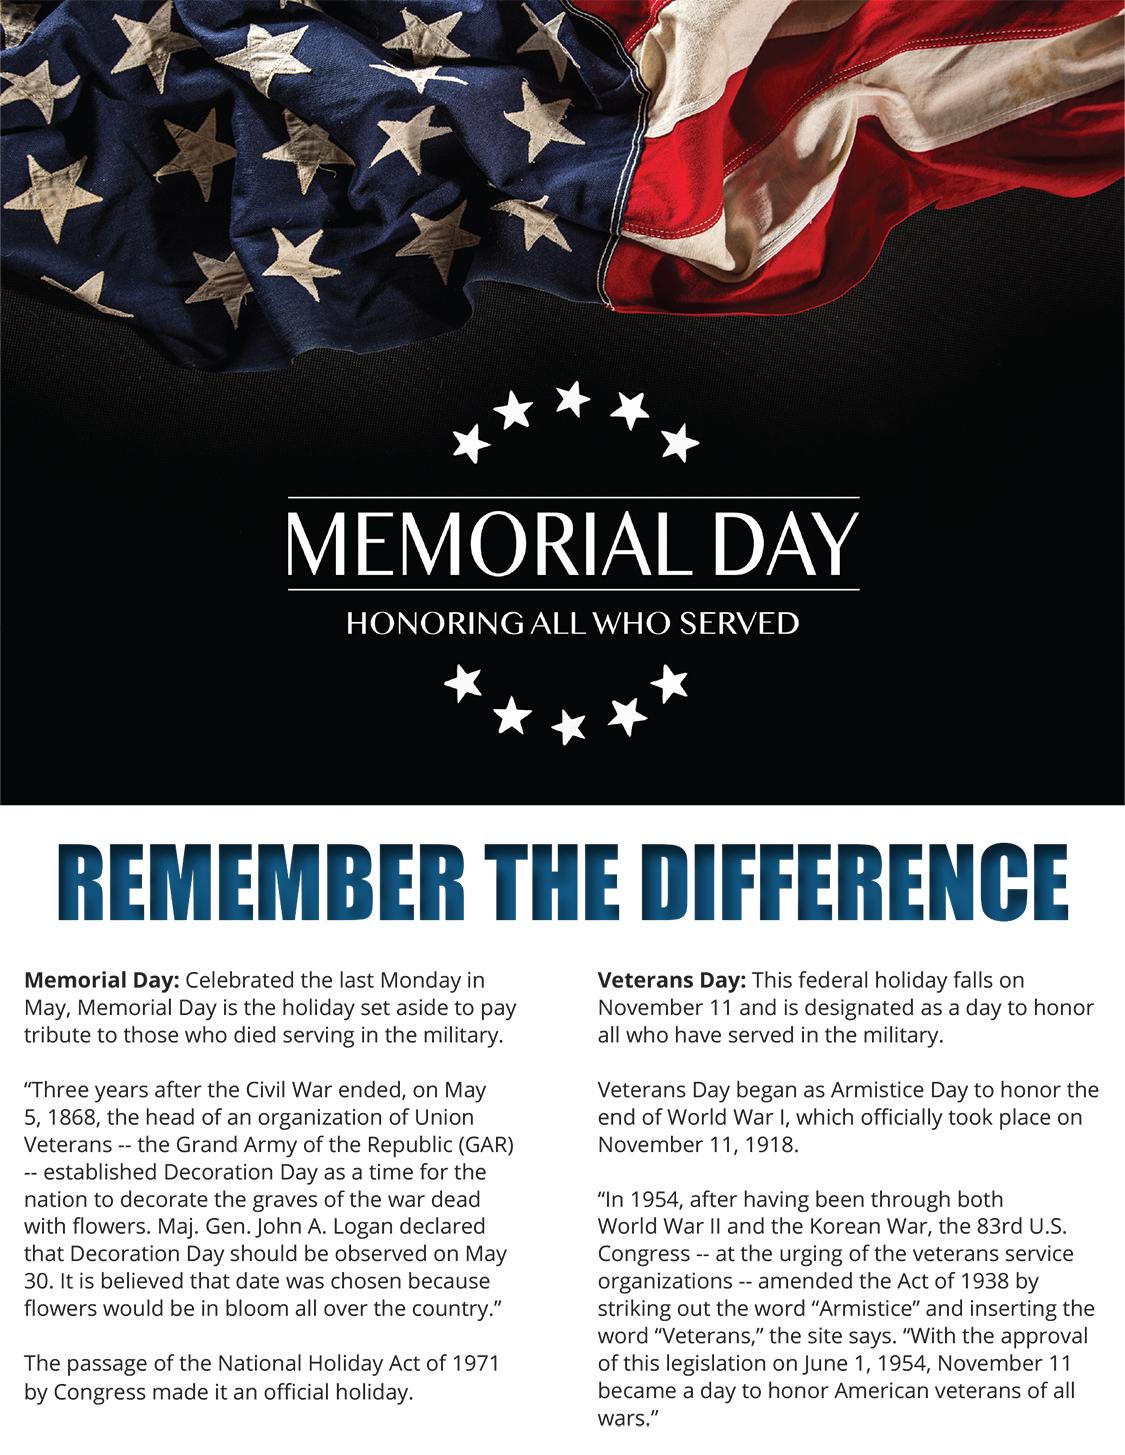 http://sandiegoveteransmagazine.com/wp-content/uploads/2020/05/San-Diego-Veterans-May-2020-Diff.jpg